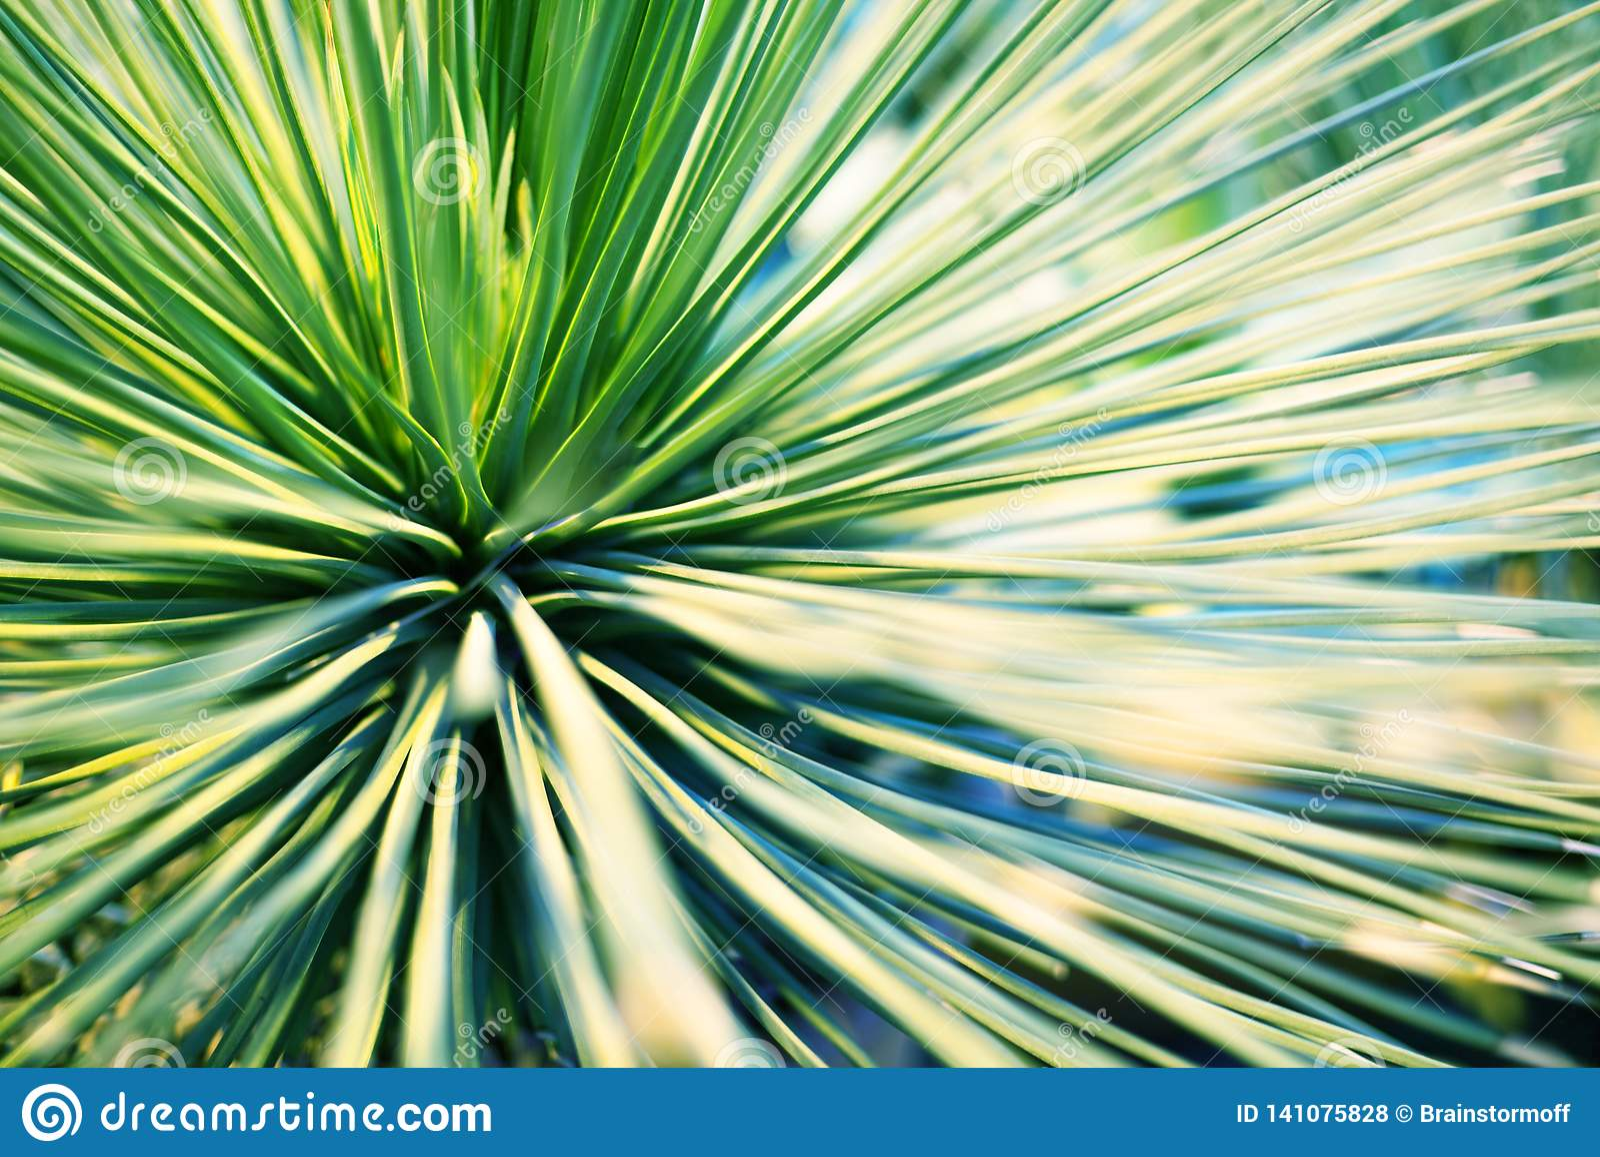 Heldergroene bladeren van palm of sier houseplant vage achtergrondclose-upmacro